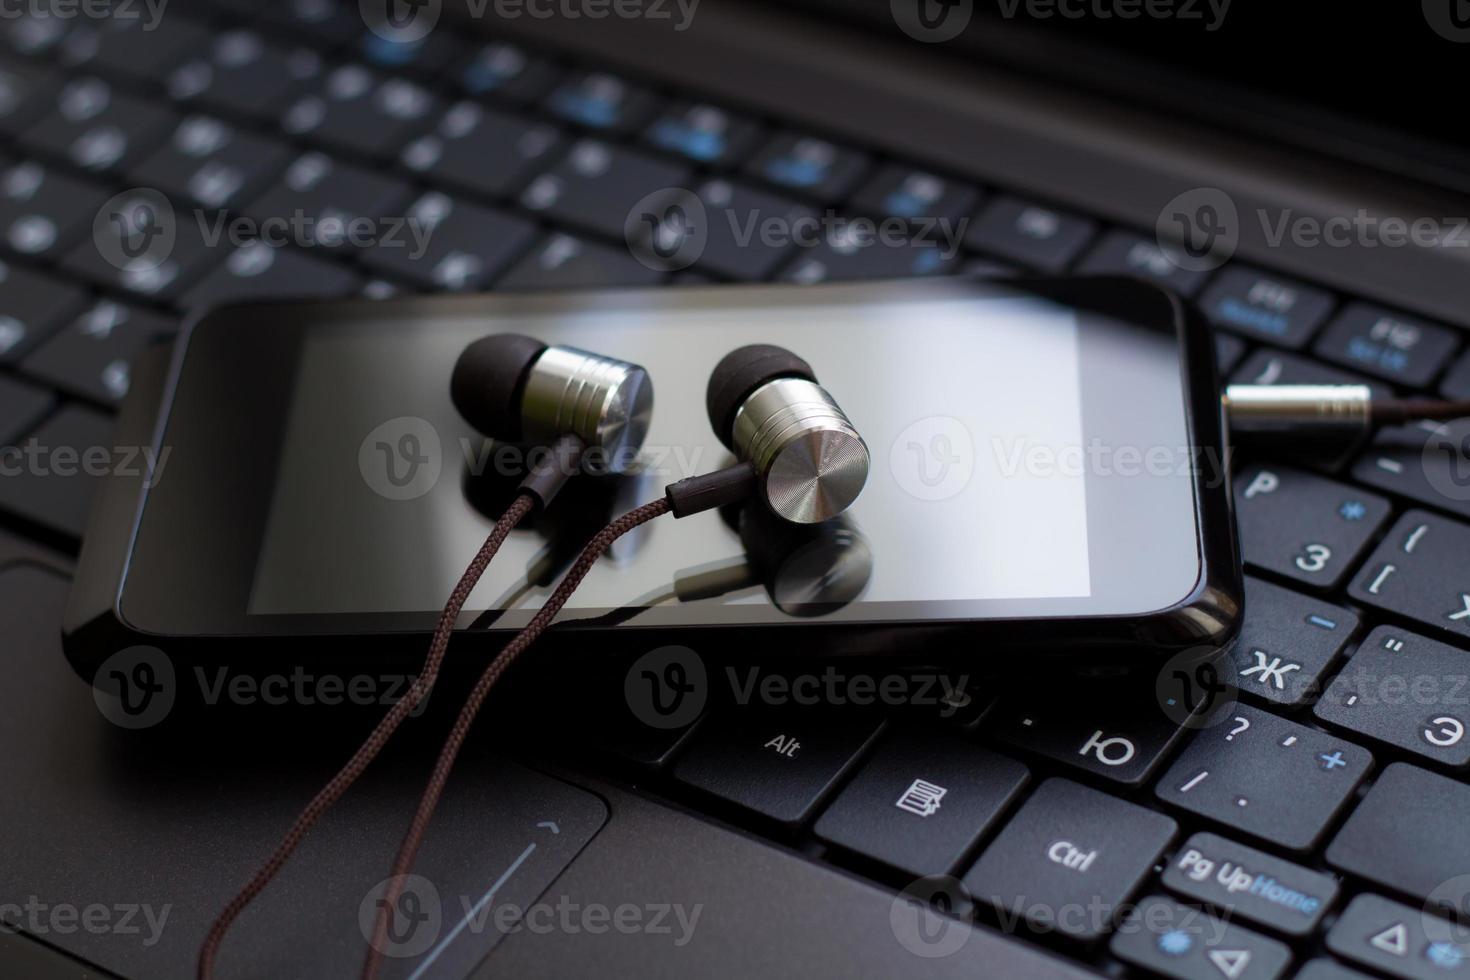 hoofdtelefoon en mobiele telefoon op het toetsenbord. foto